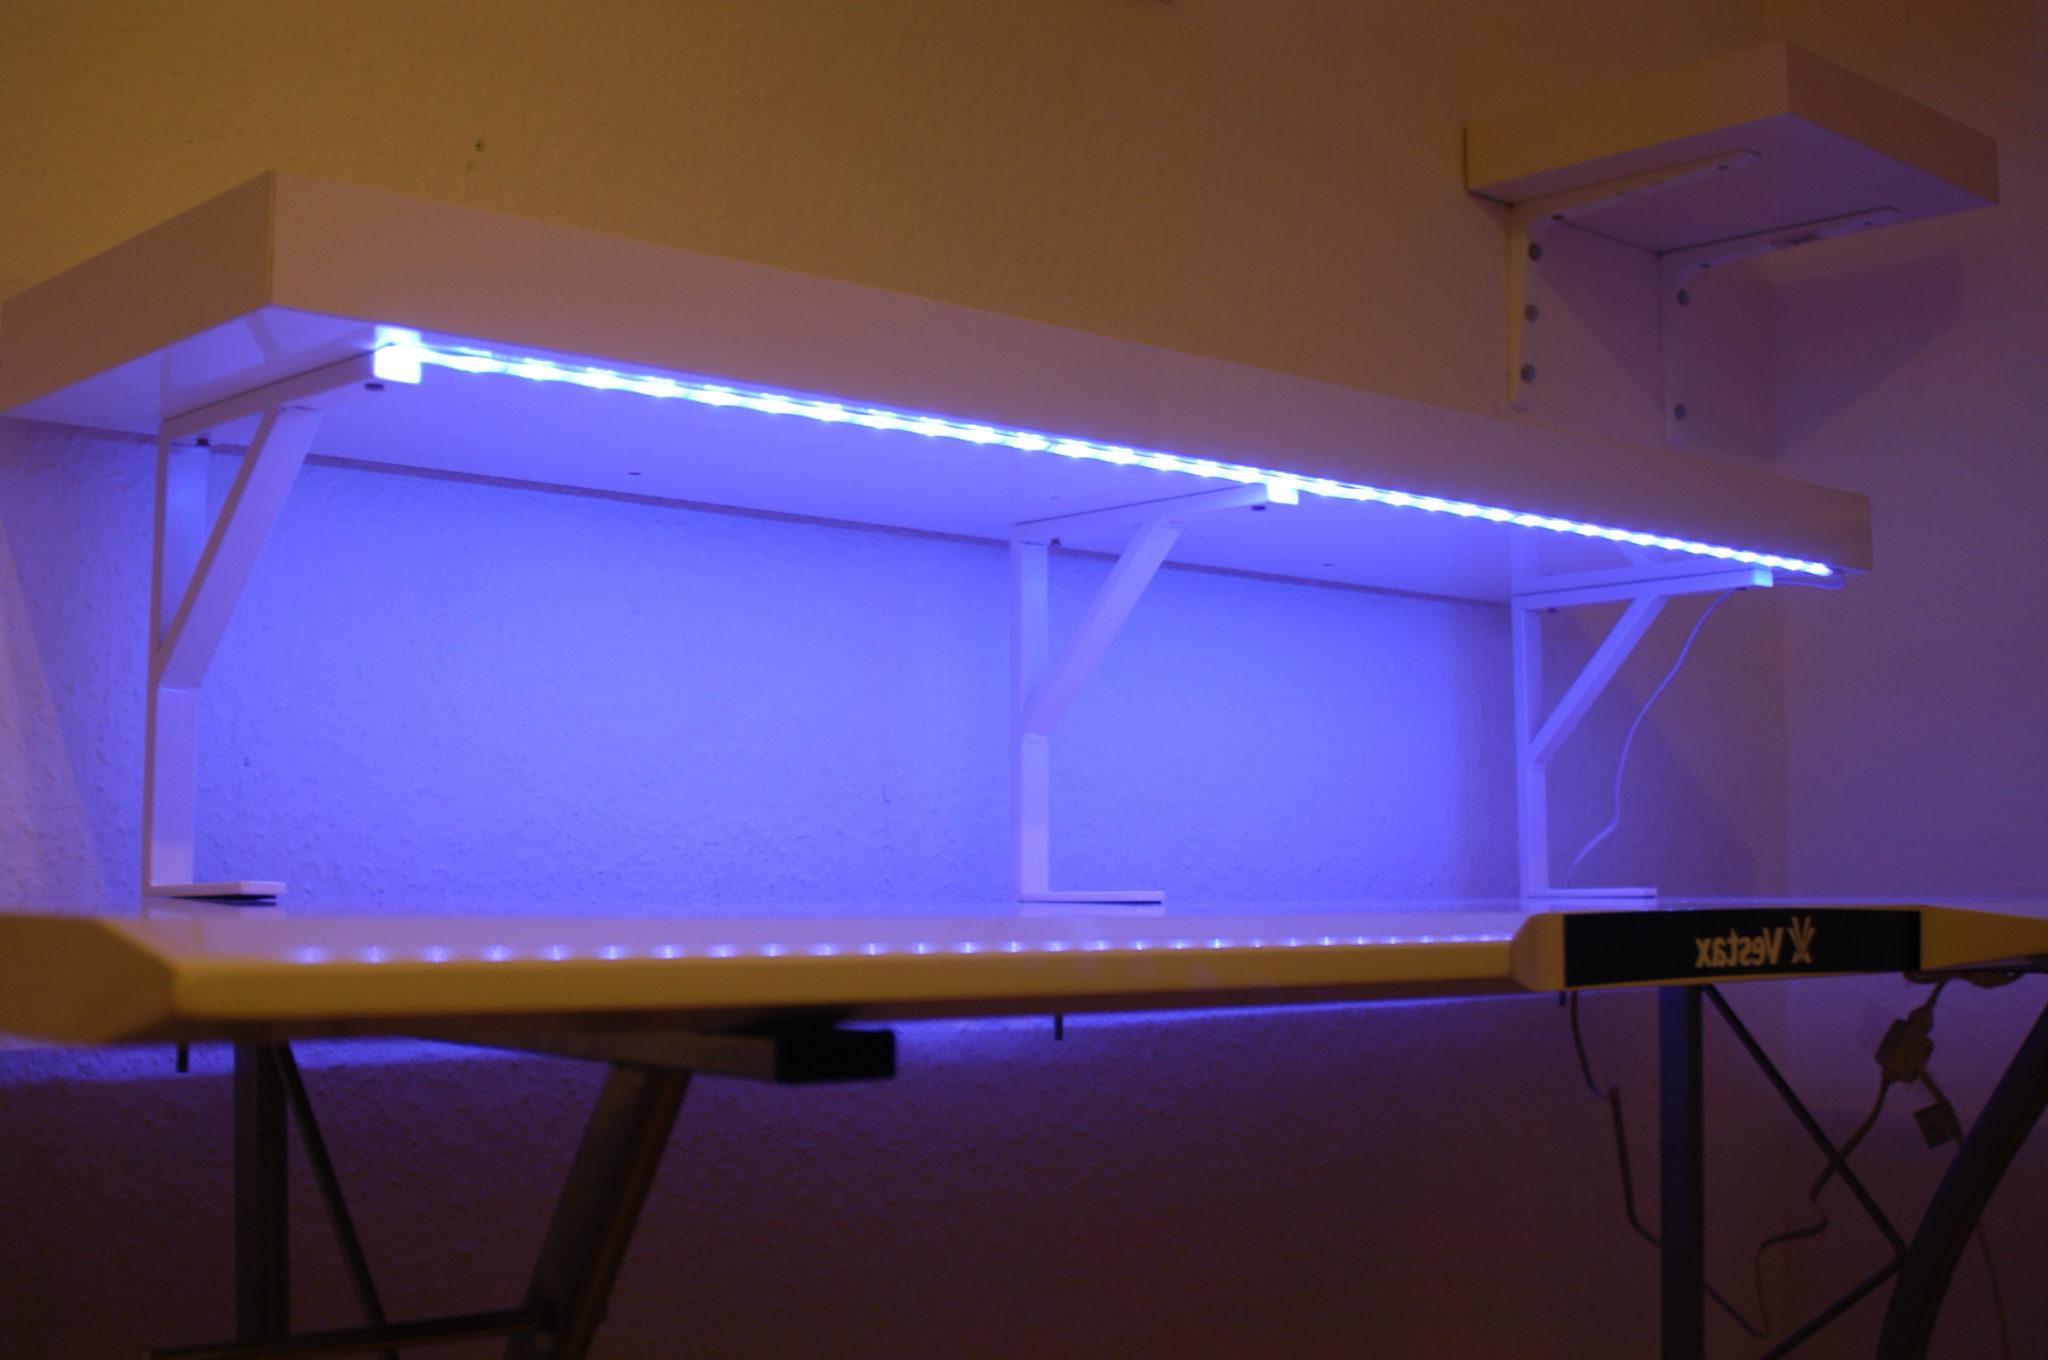 Mesa Dj Ikea Irdz How to Create A Professional Dj Booth From Ikea Parts Dj Techtools